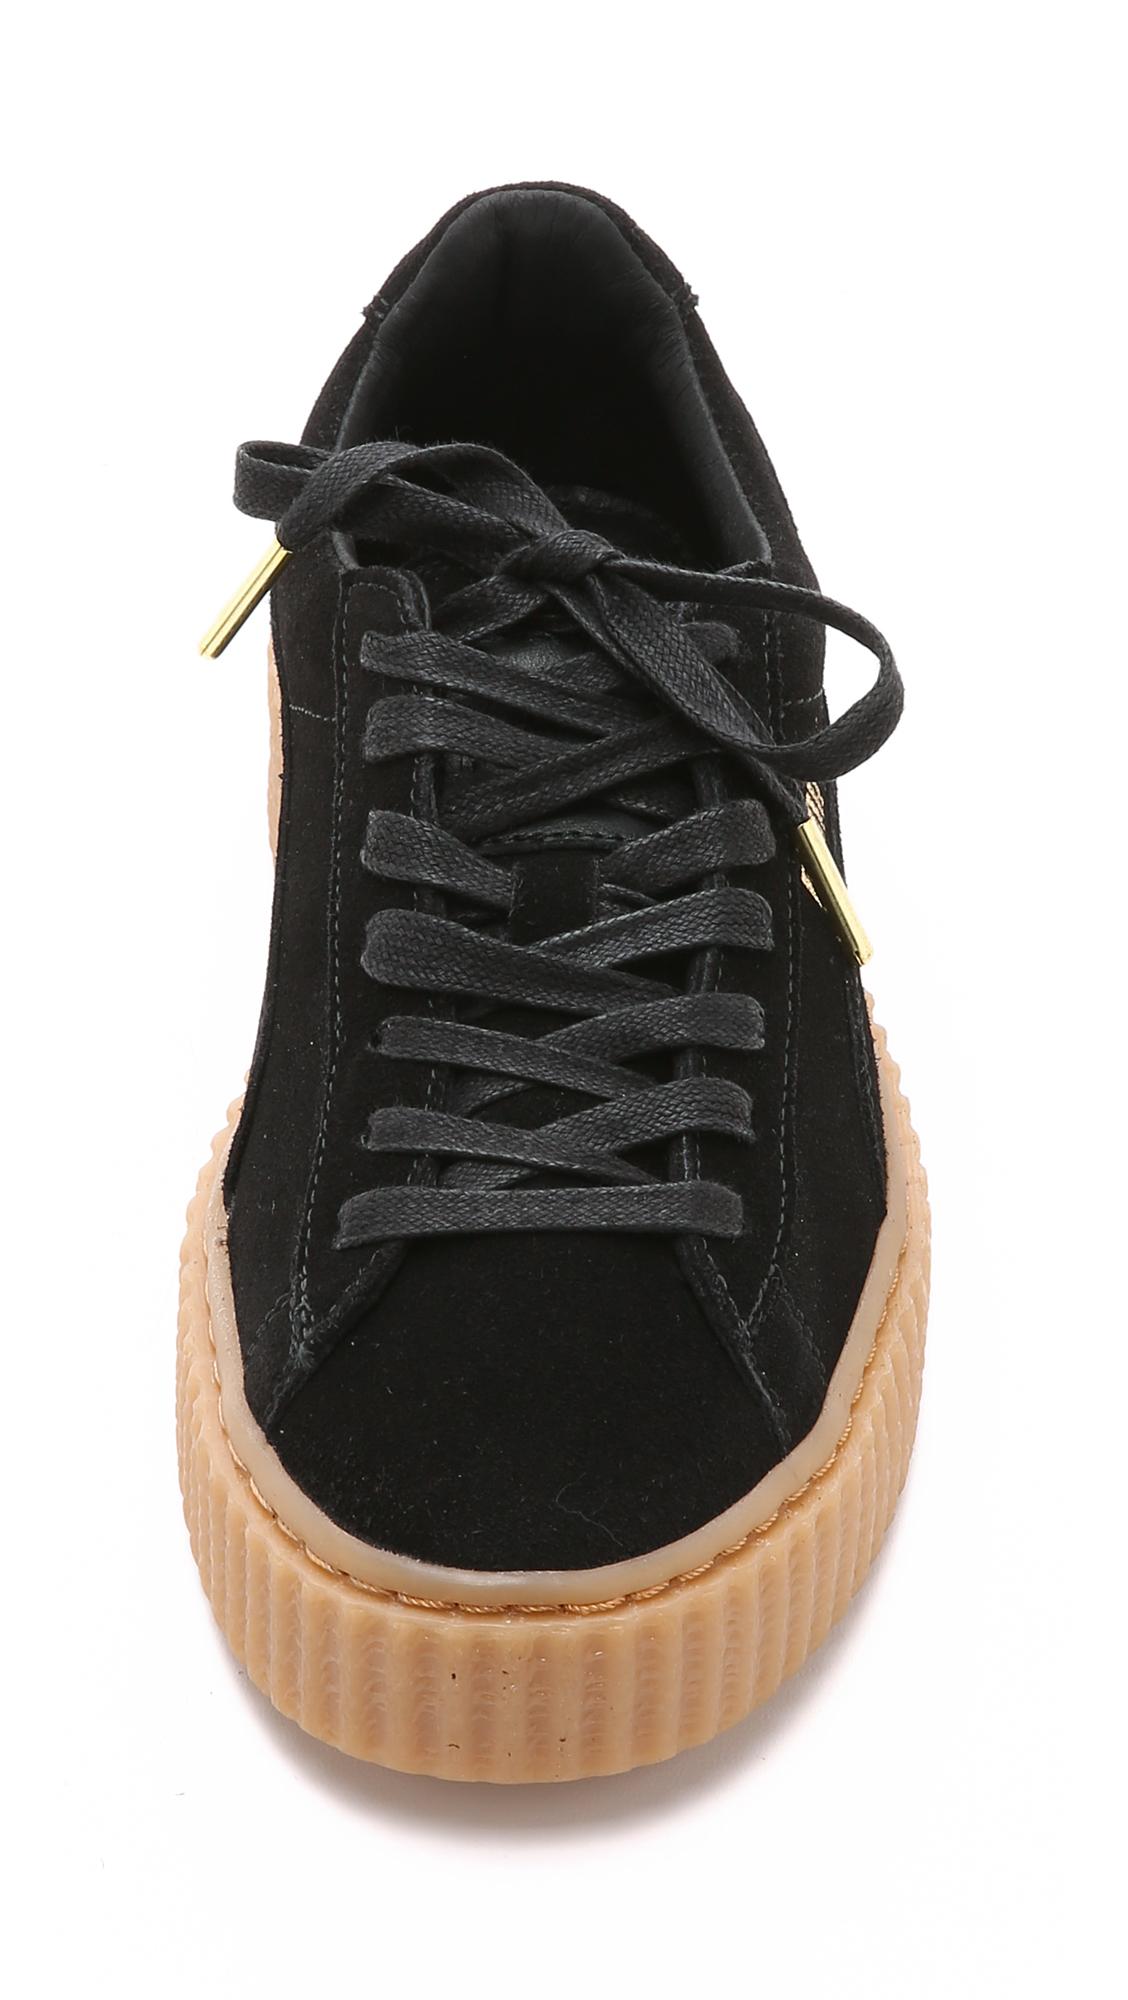 857df0517d0 Lyst - PUMA X Rihanna Creeper Sneakers - Black gum in Black